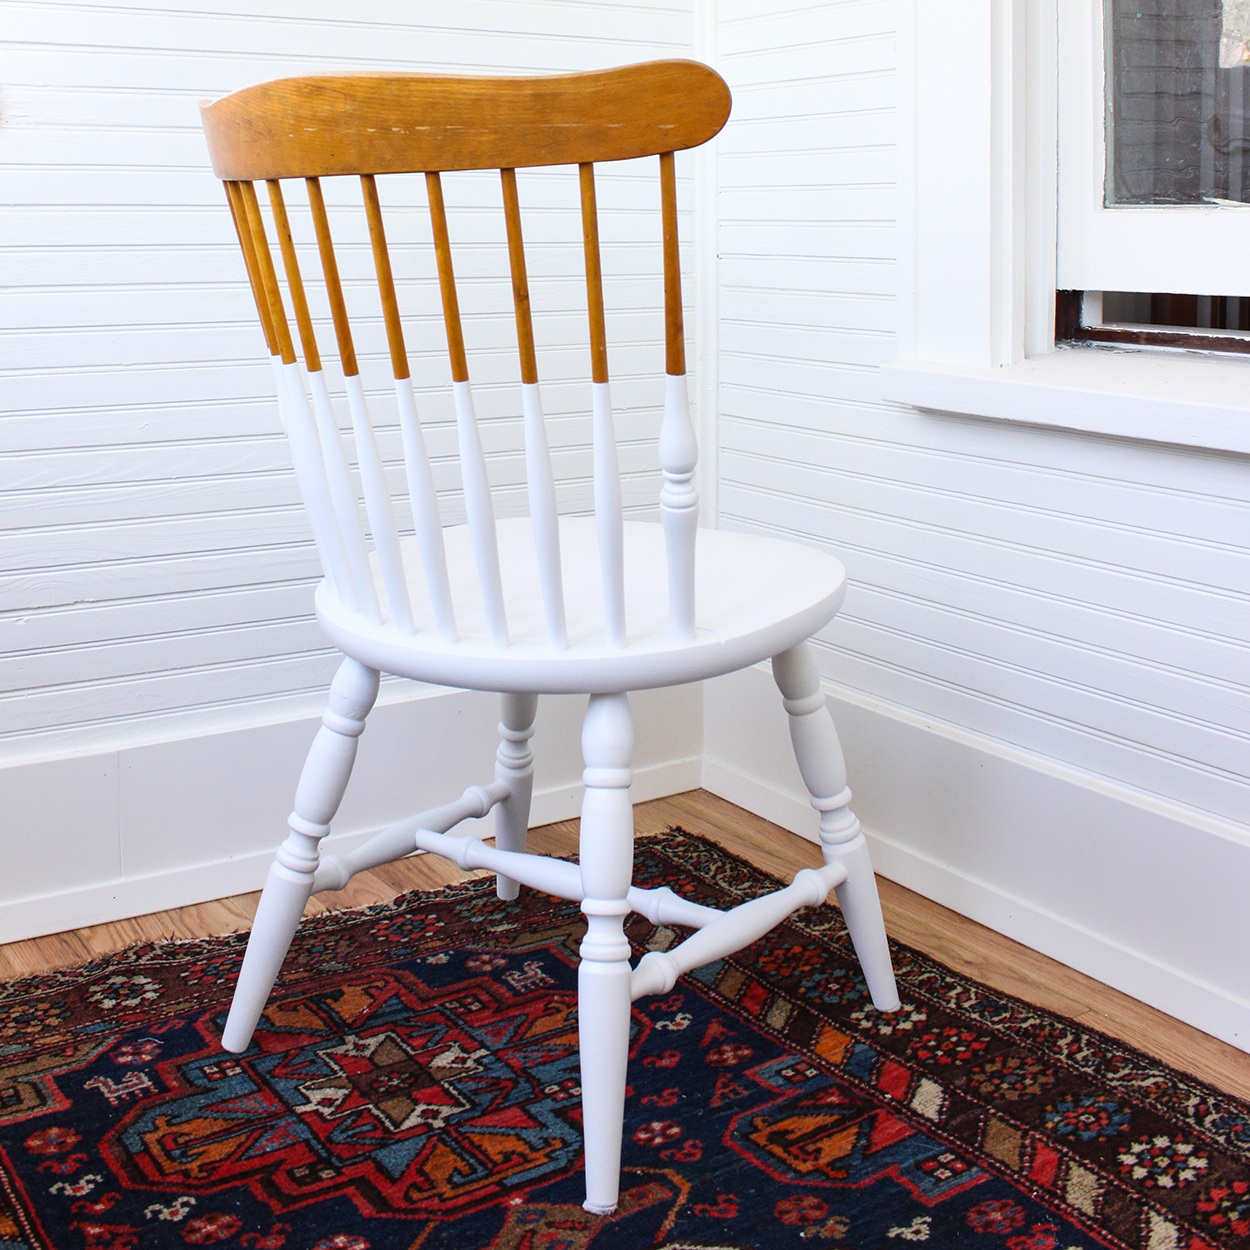 paint dipped chair II bk.jpg